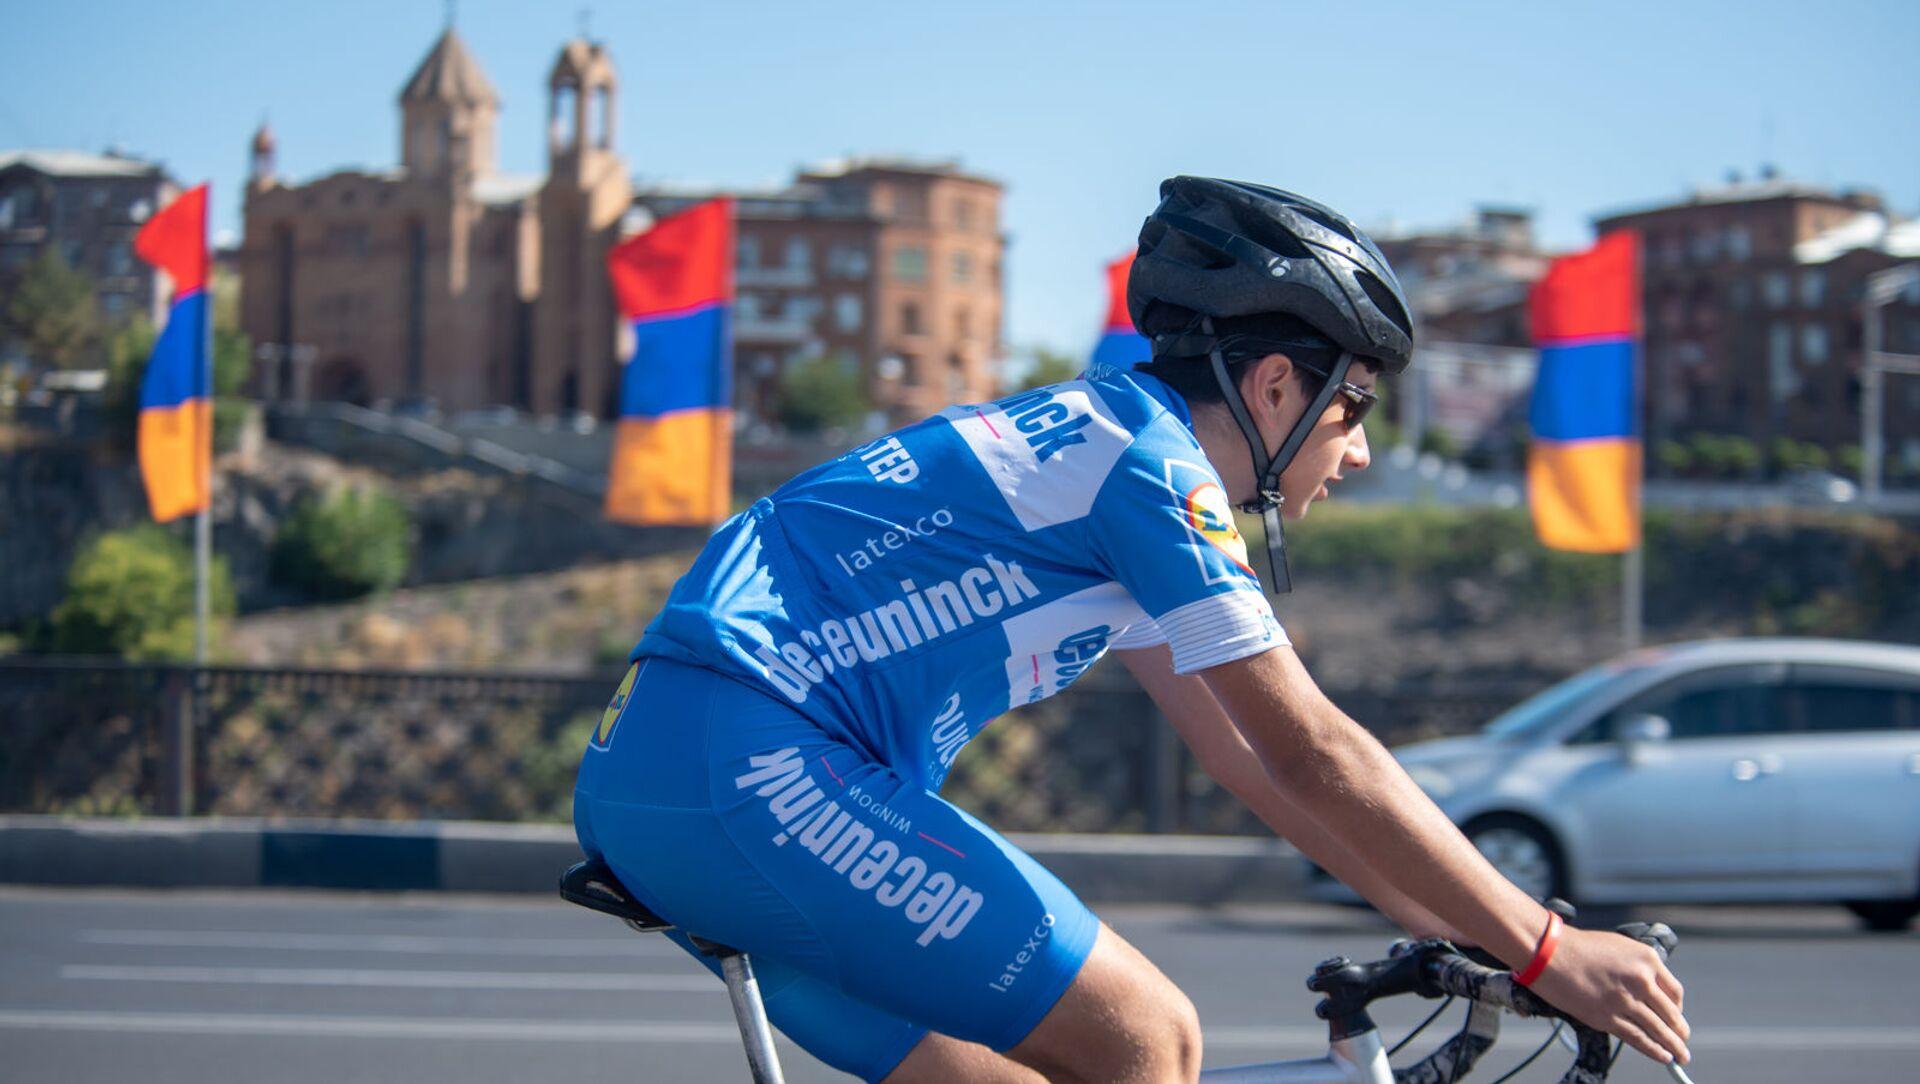 Велосипедный марафон Велотон Ереван (22 сентября 2019). Ереван - Sputnik Արմենիա, 1920, 07.06.2021